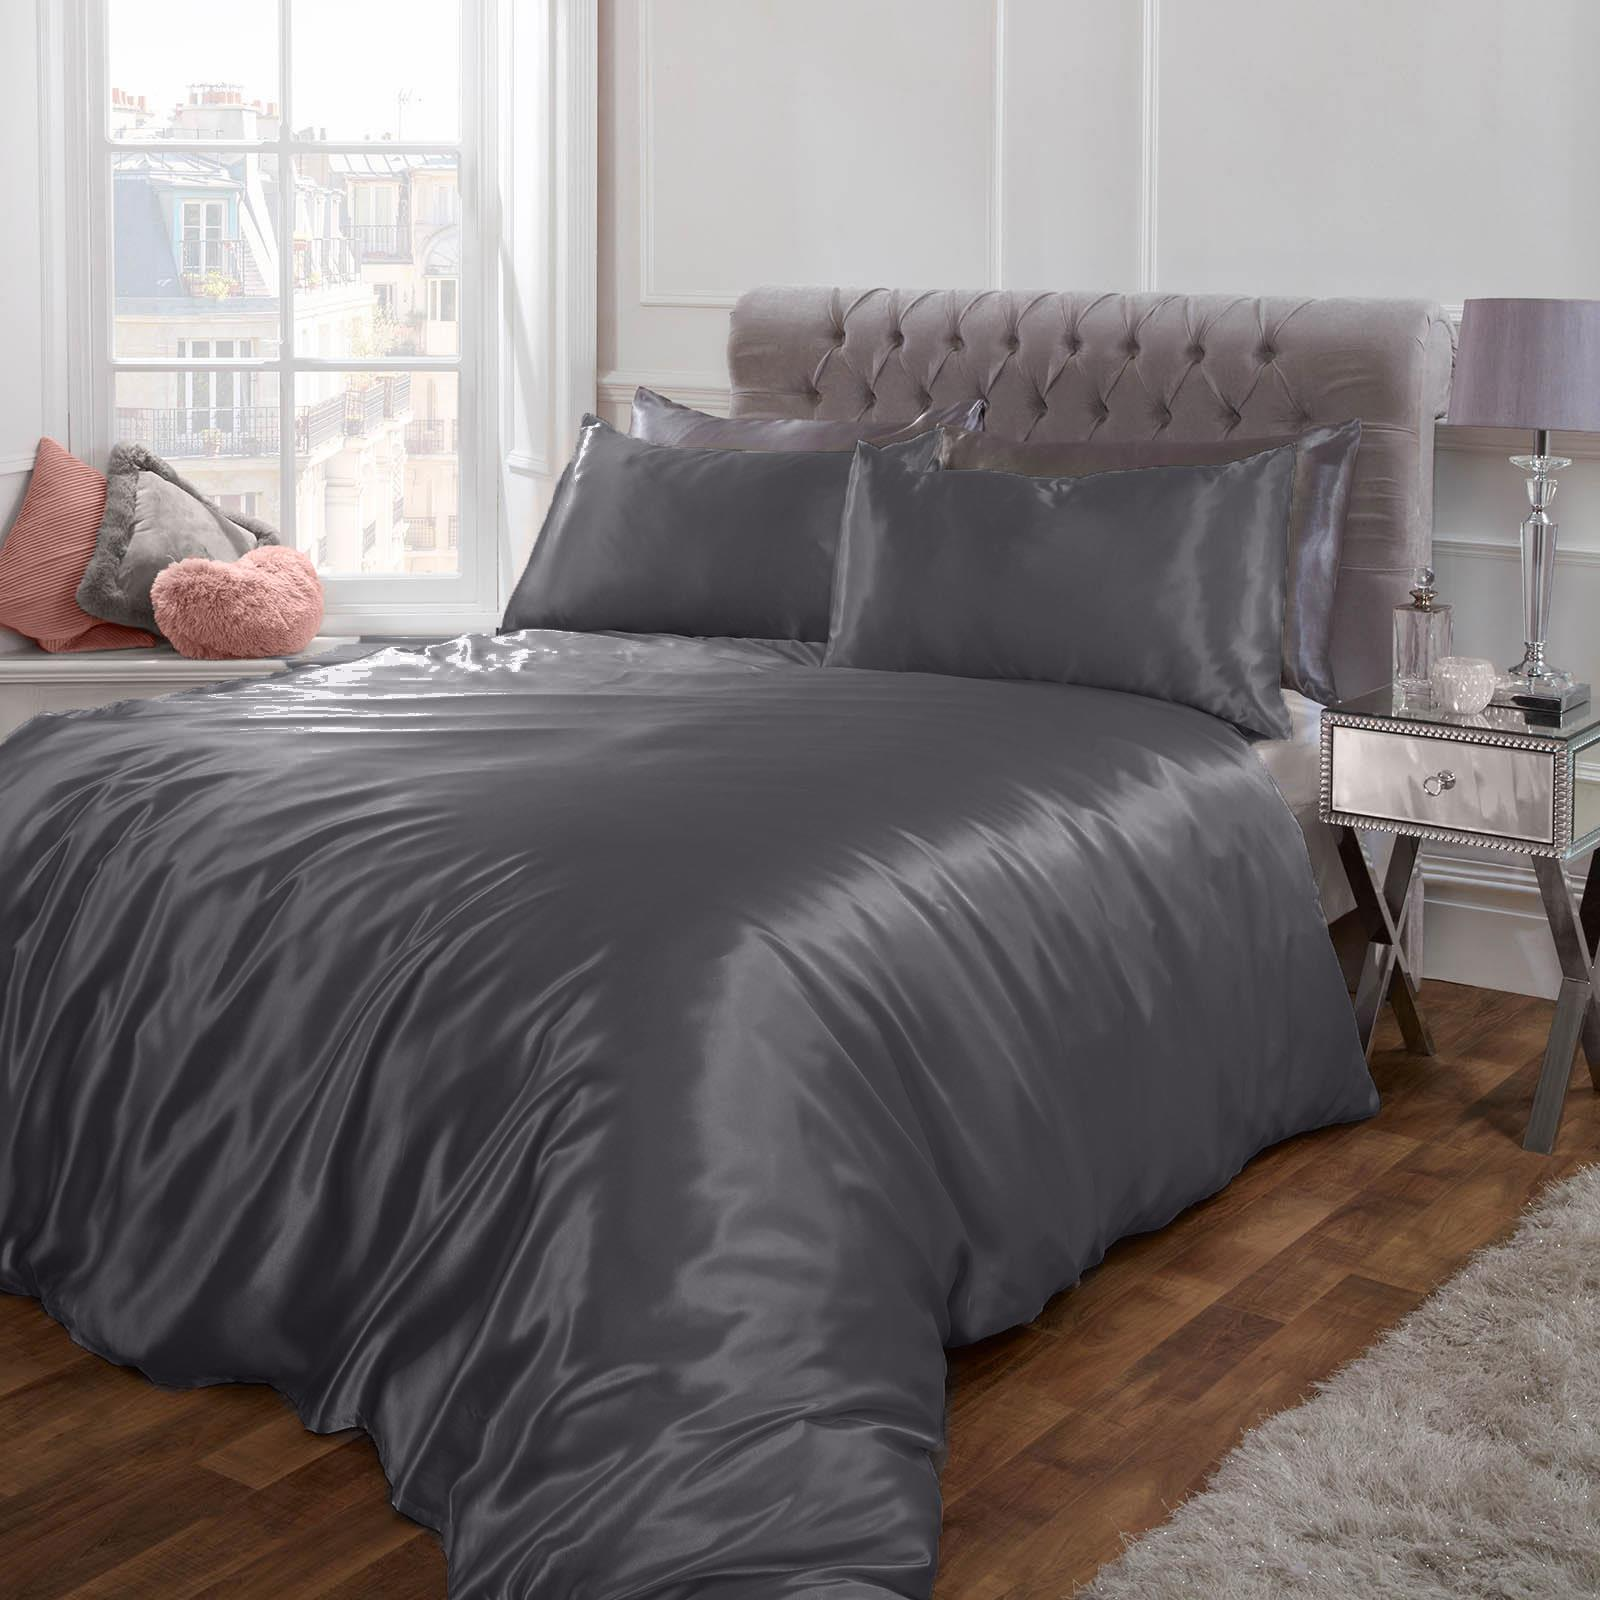 thumbnail 23 - Sienna Satin Silk Duvet Cover with Pillowcases Bedding Set, Blush Pink Silver